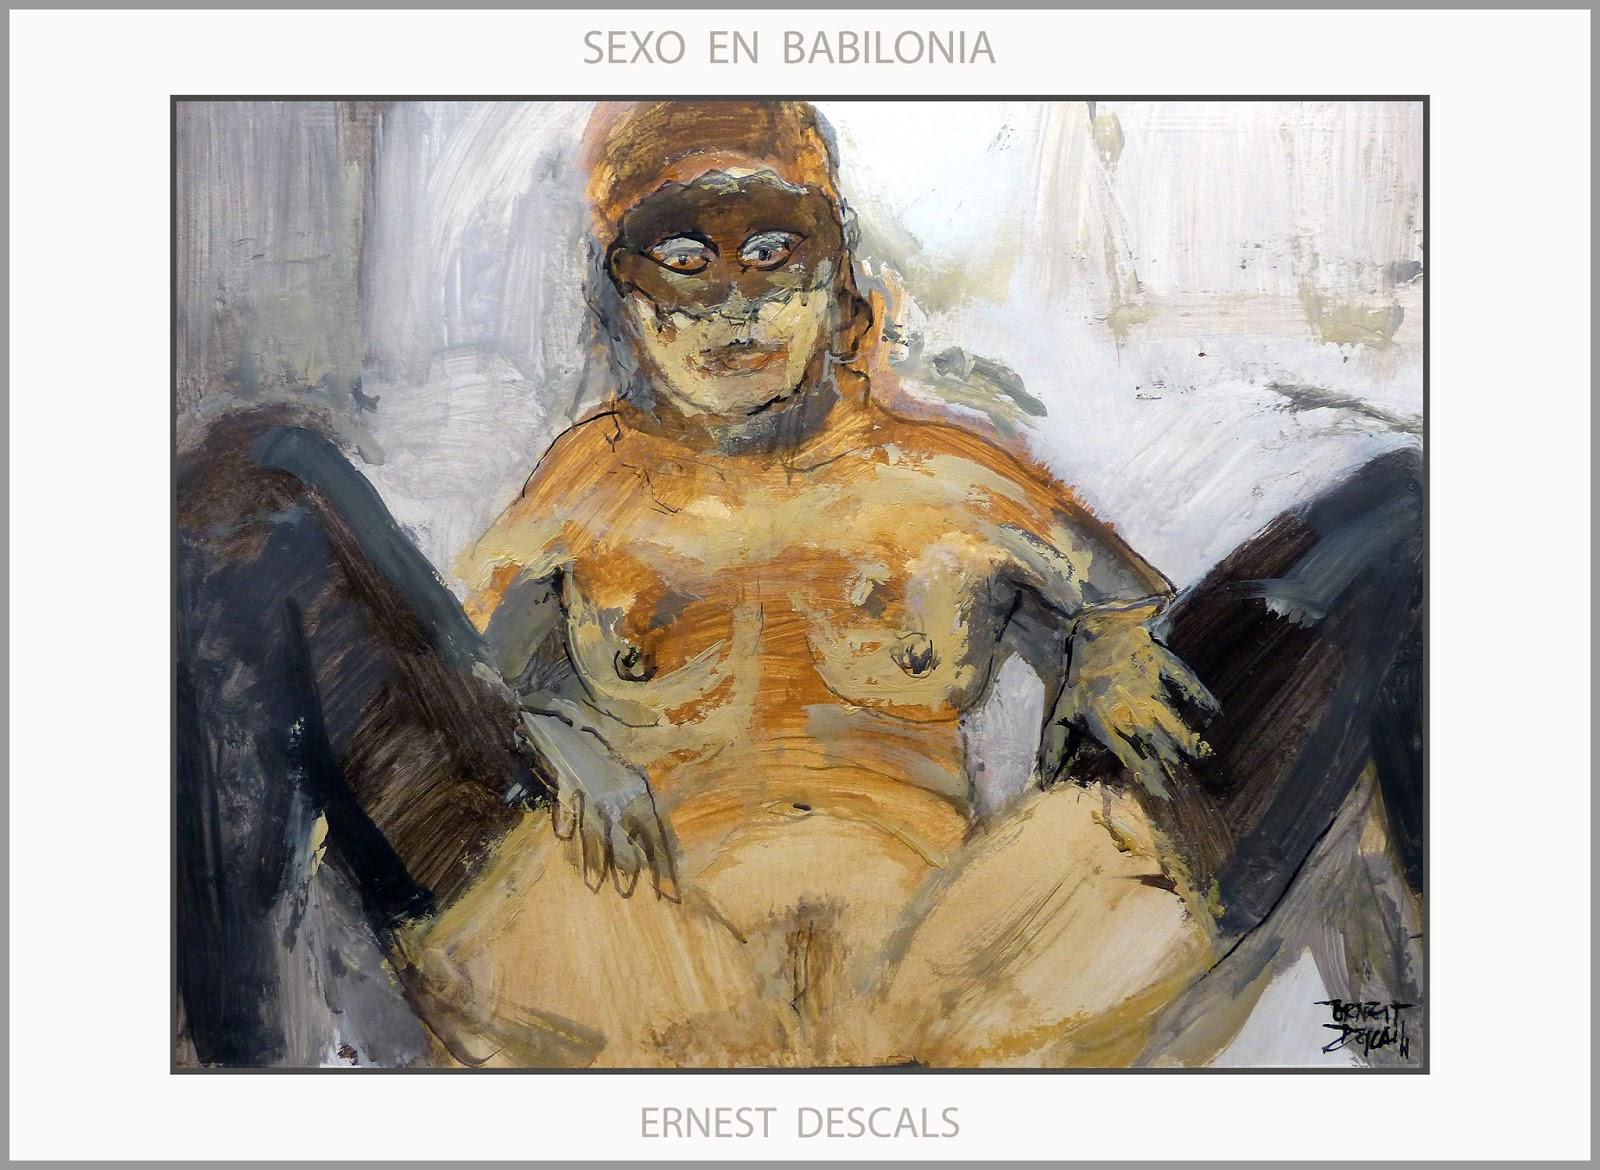 Arte de ligar mujeres sexo ahora Santa Cruz Tenerife-51528